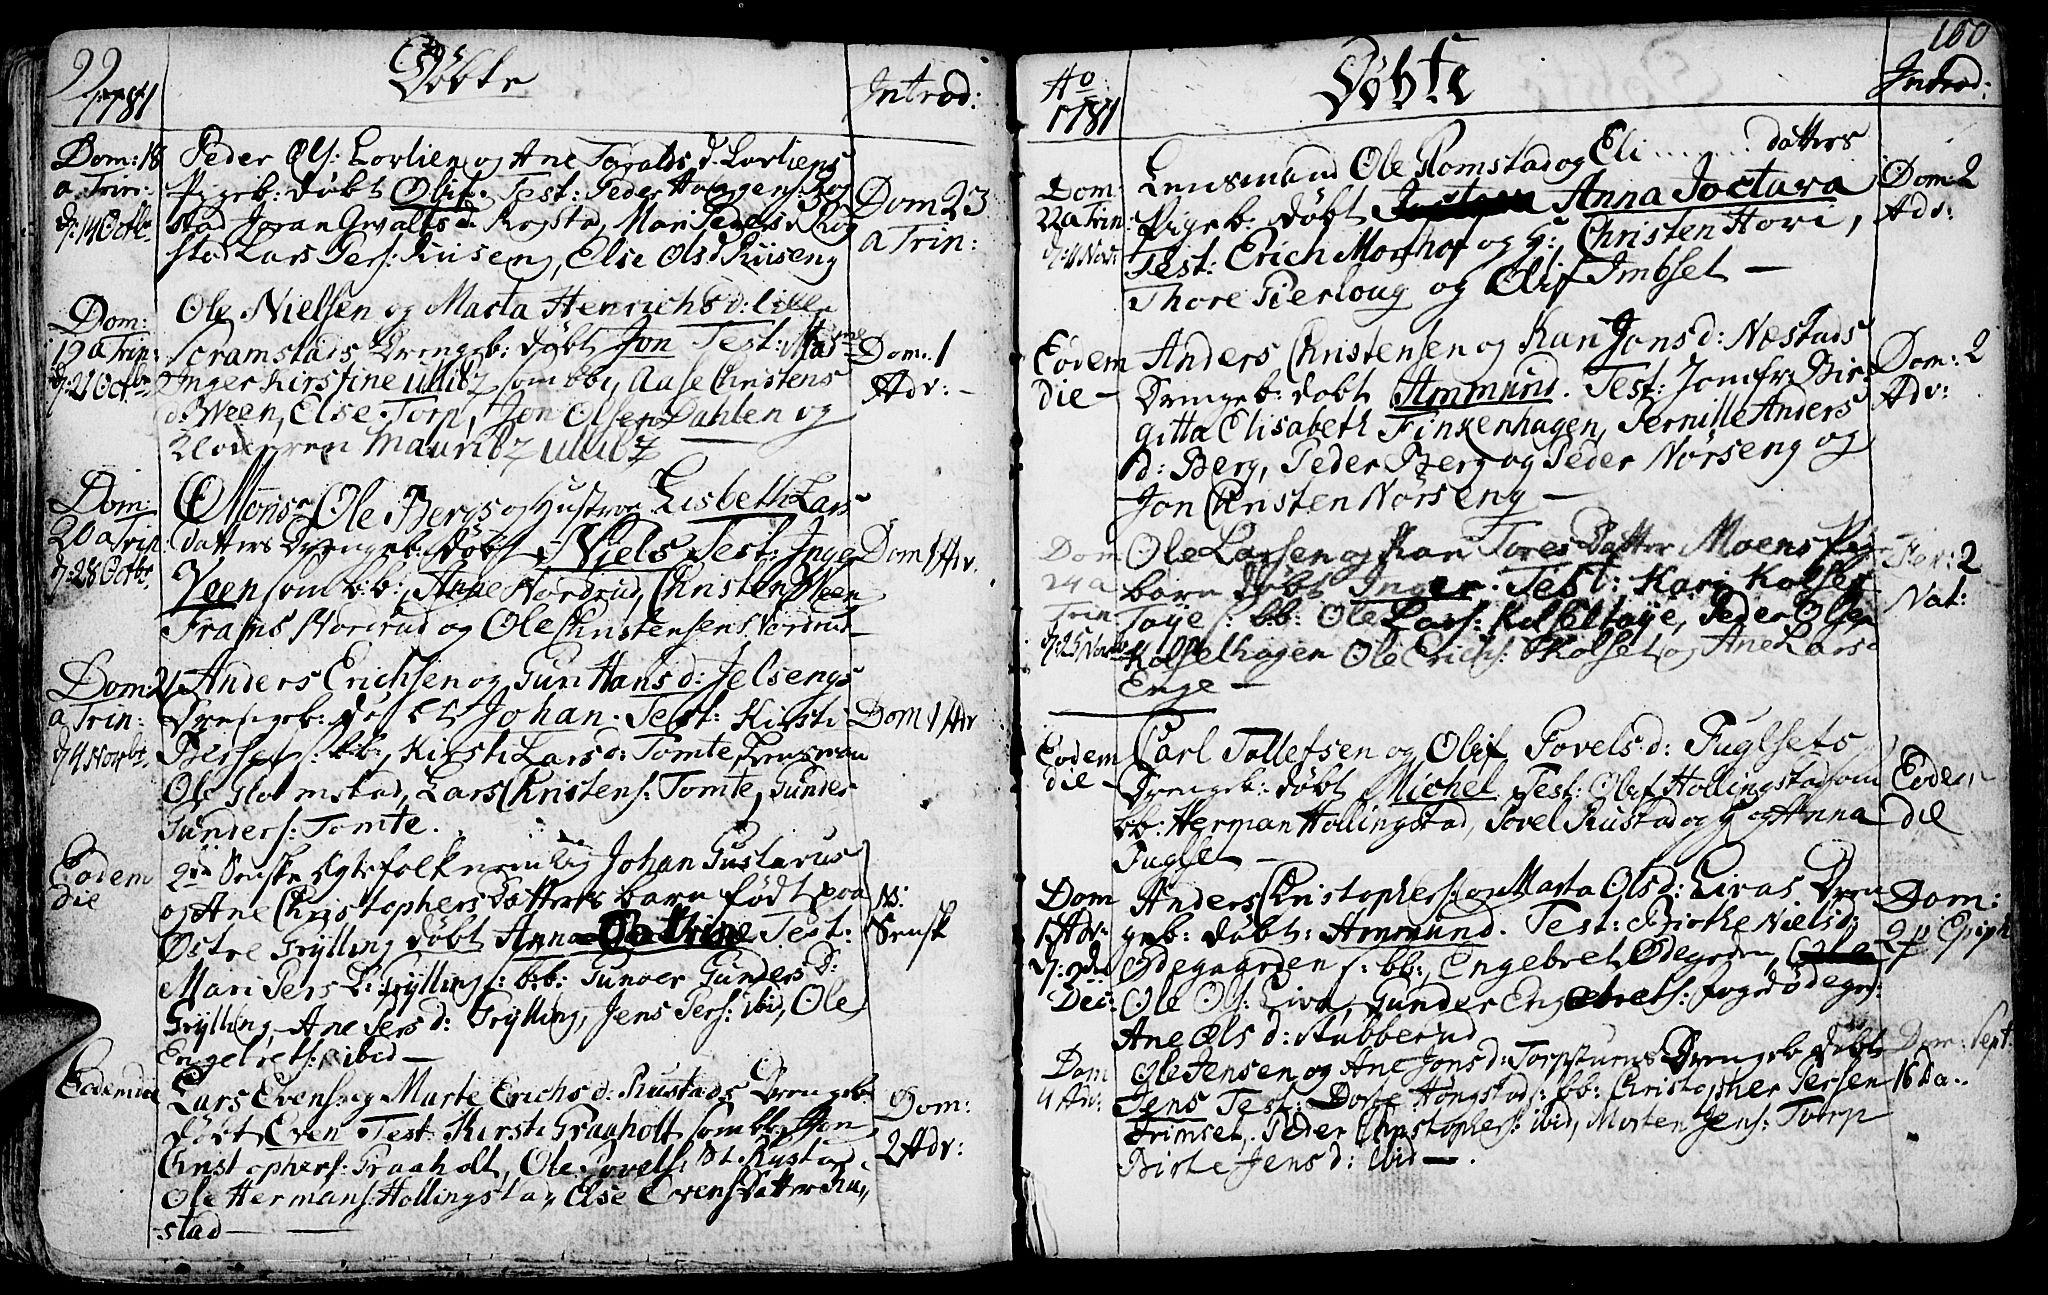 SAH, Løten prestekontor, K/Ka/L0003: Ministerialbok nr. 3, 1773-1800, s. 99-100